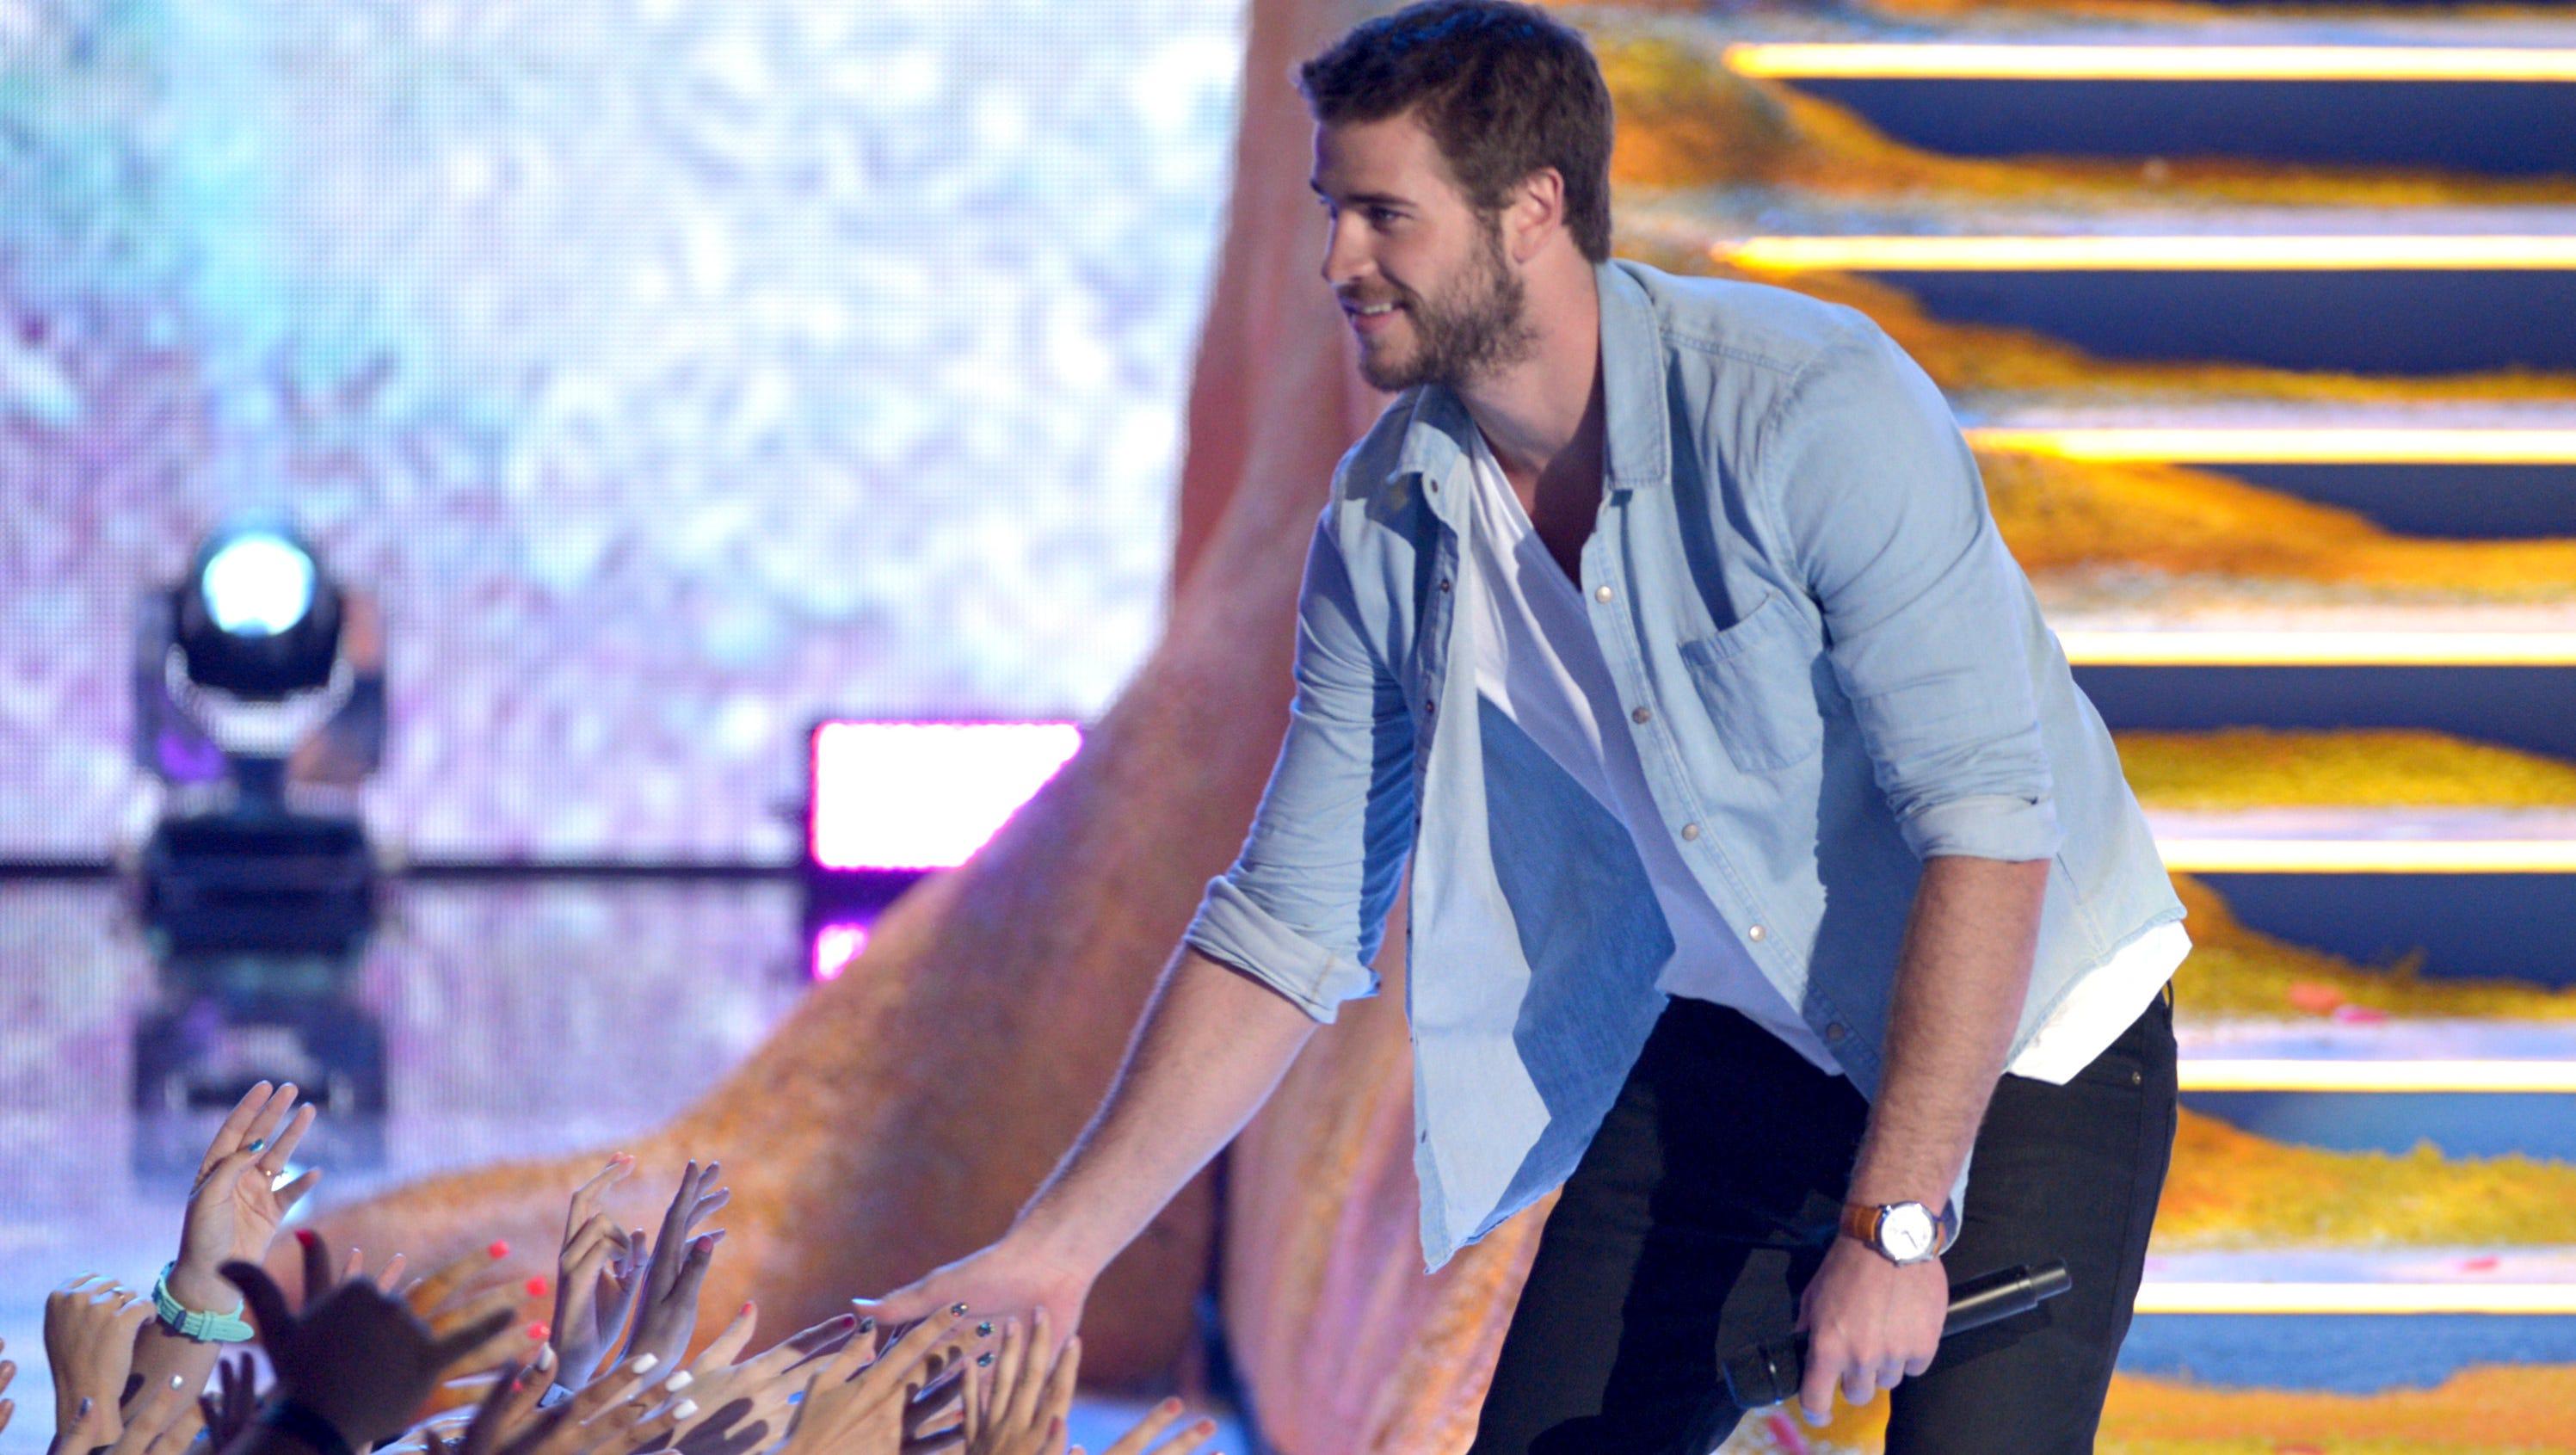 Presenter Liam Hemsworth works the crowd.